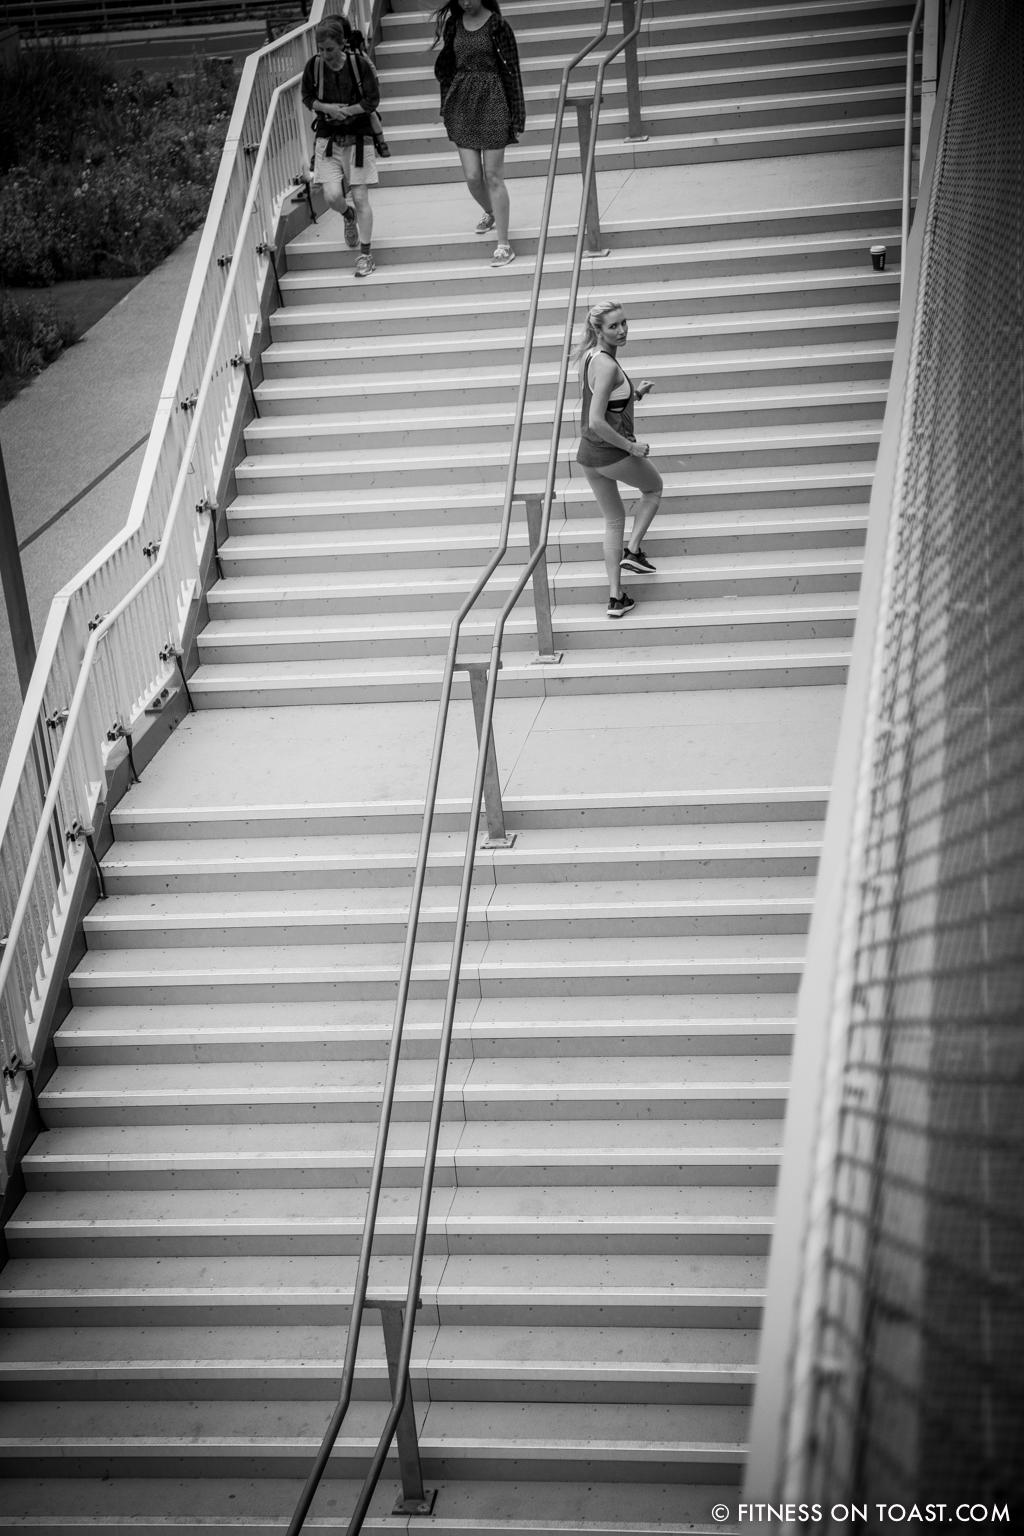 Fitness On Toast Faya Blog Girl Healthy Jog Olympic Park Wagamama Nutrition BPay Barclays London Olympics 2012 Health Stratford-9